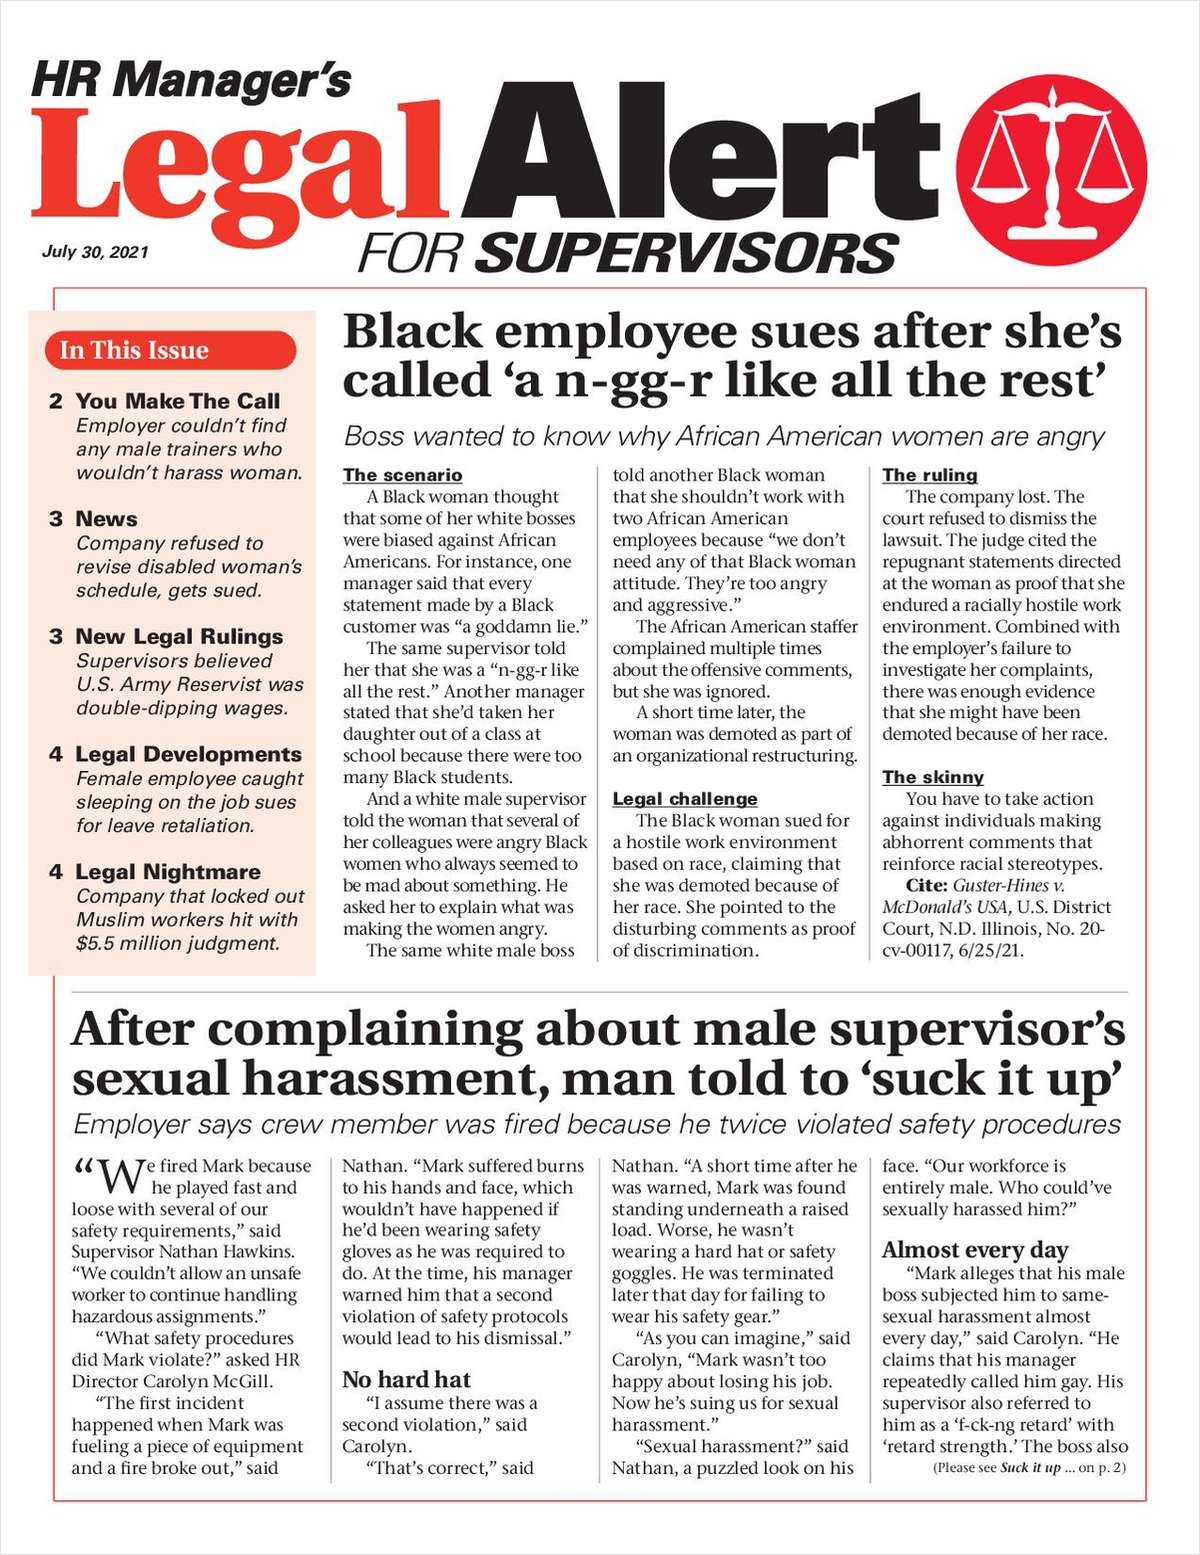 HR Manager's Legal Alert for Supervisors Newsletter: July 30 Edition